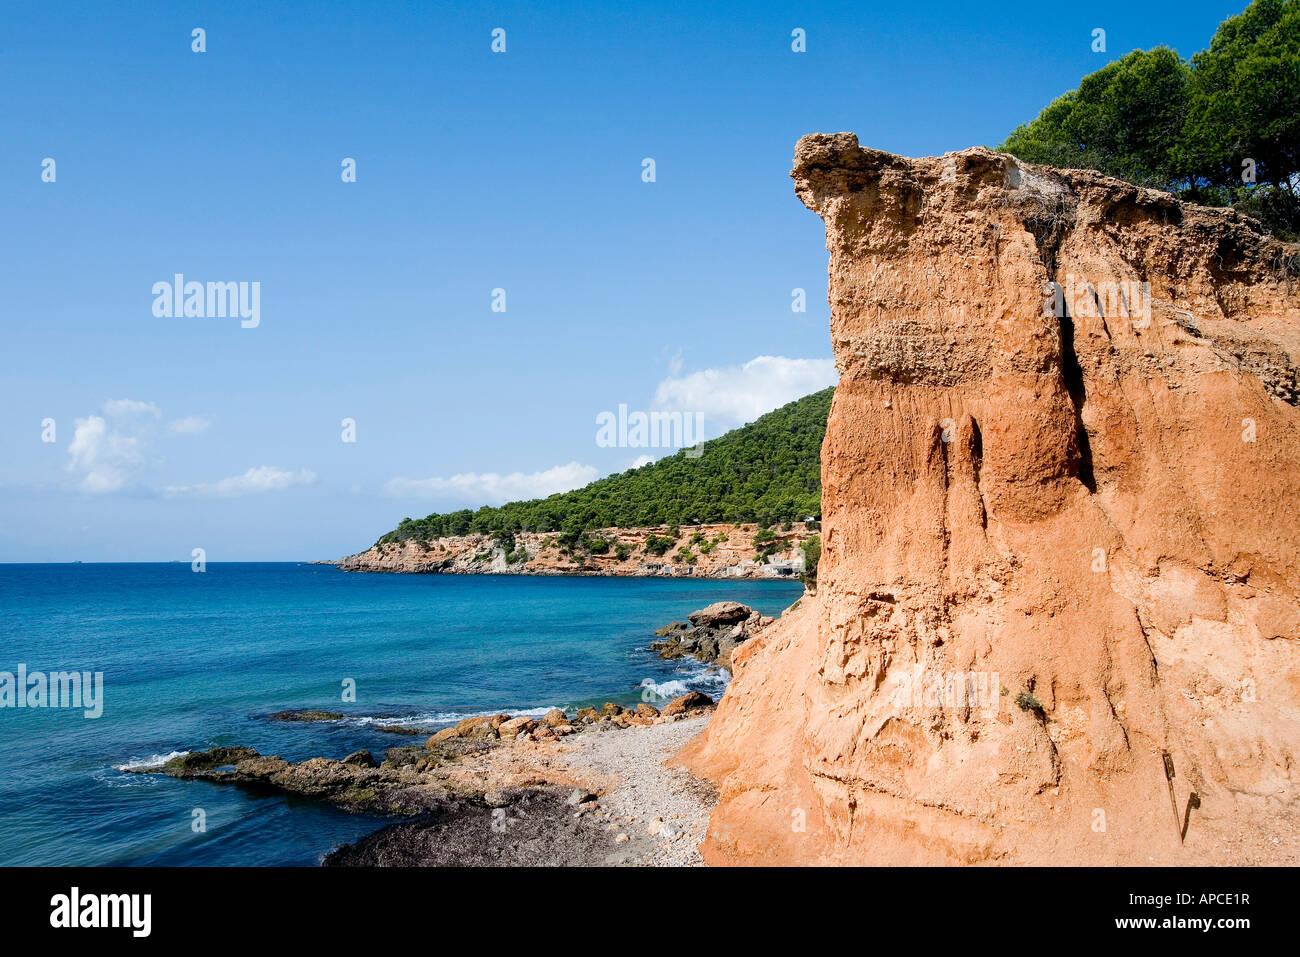 Sa Caleta, Ibiza, Balearic Islands, Spain - Stock Image